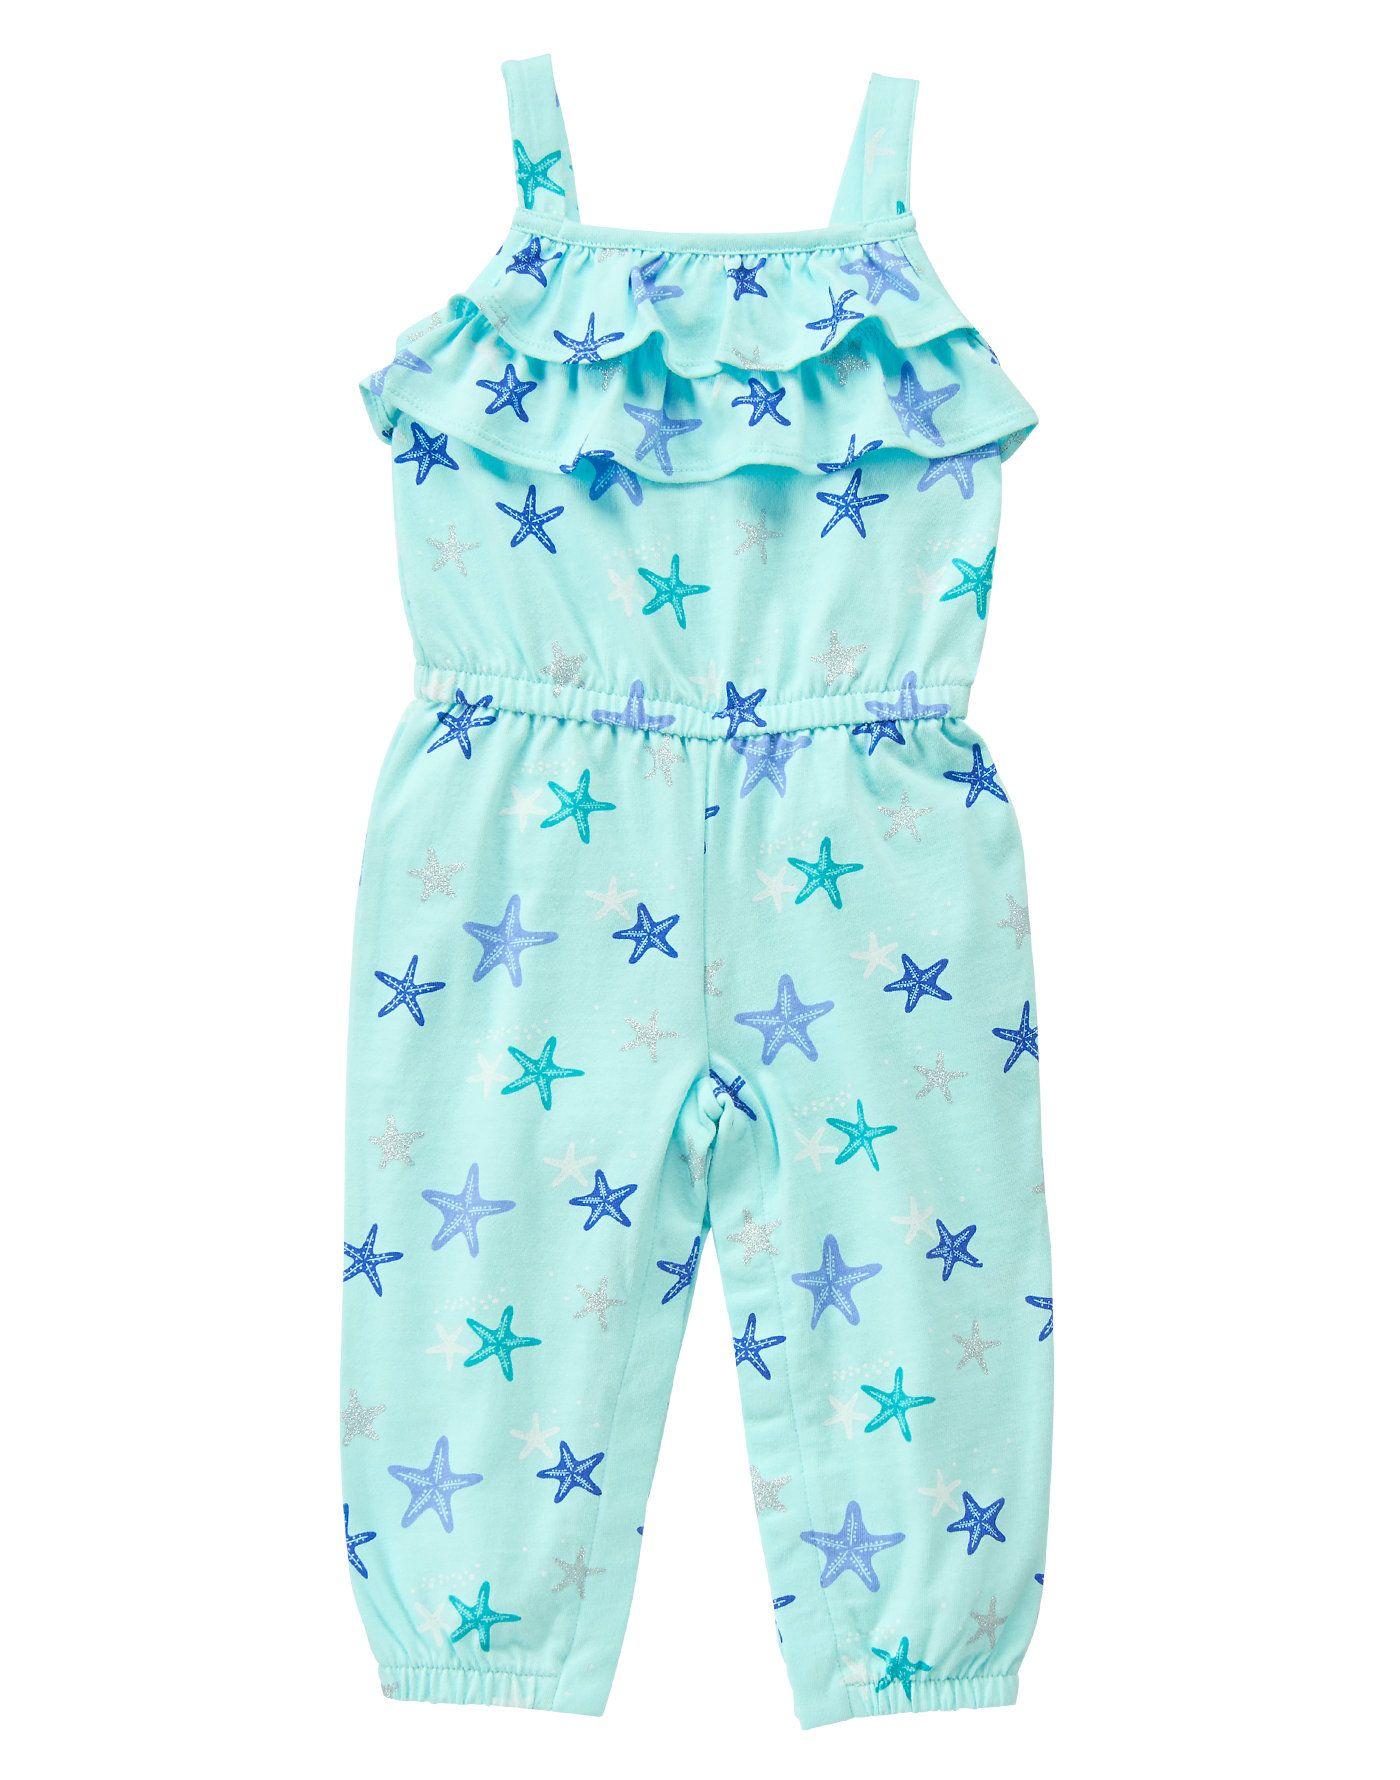 fbb1462c9 Starfish Romper My Little Baby, My Baby Girl, Girly Girl, Toddler Rooms,